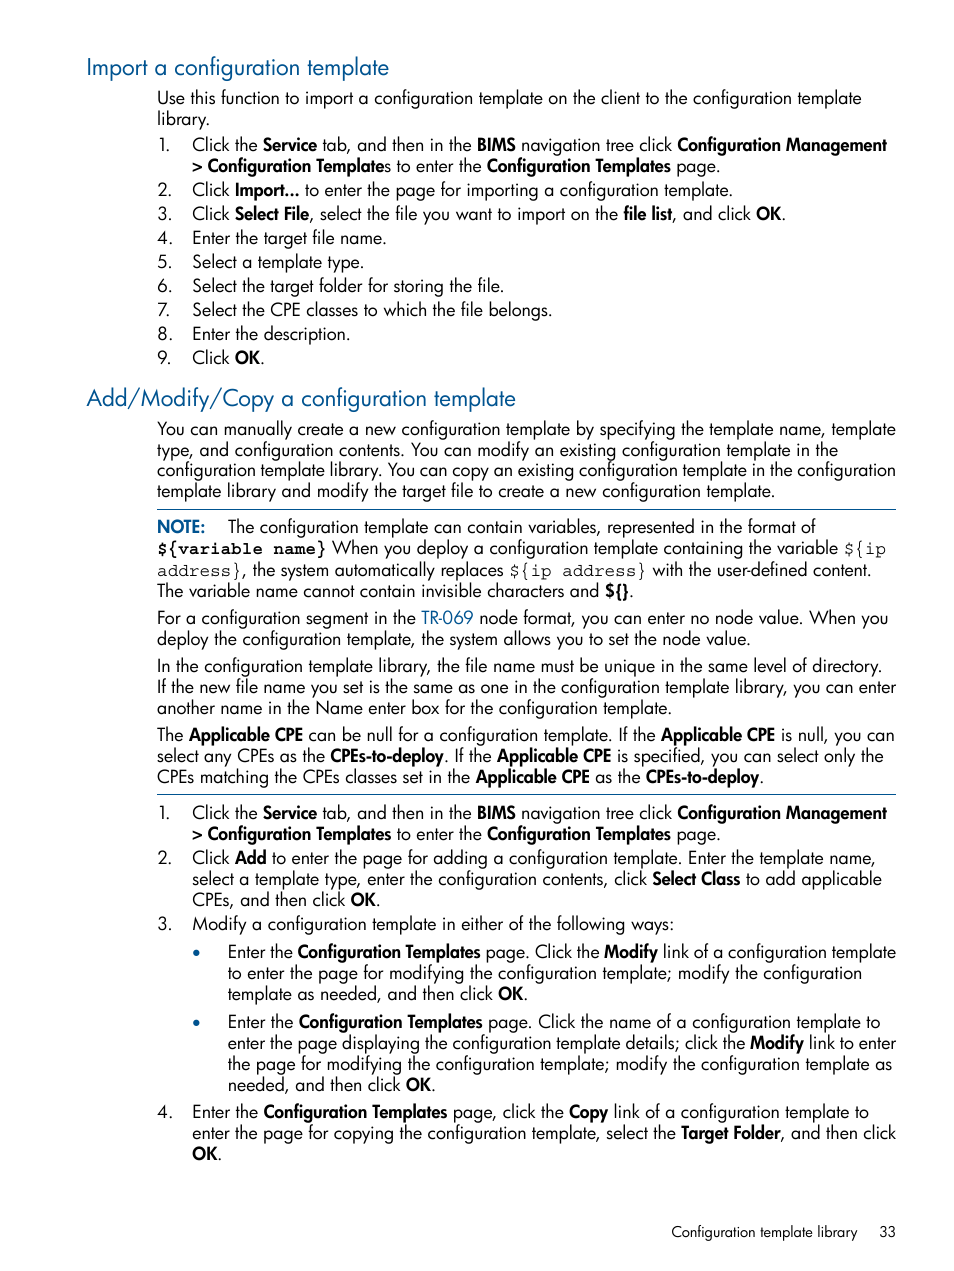 Import a configuration template, Add/modify/copy a configuration ...